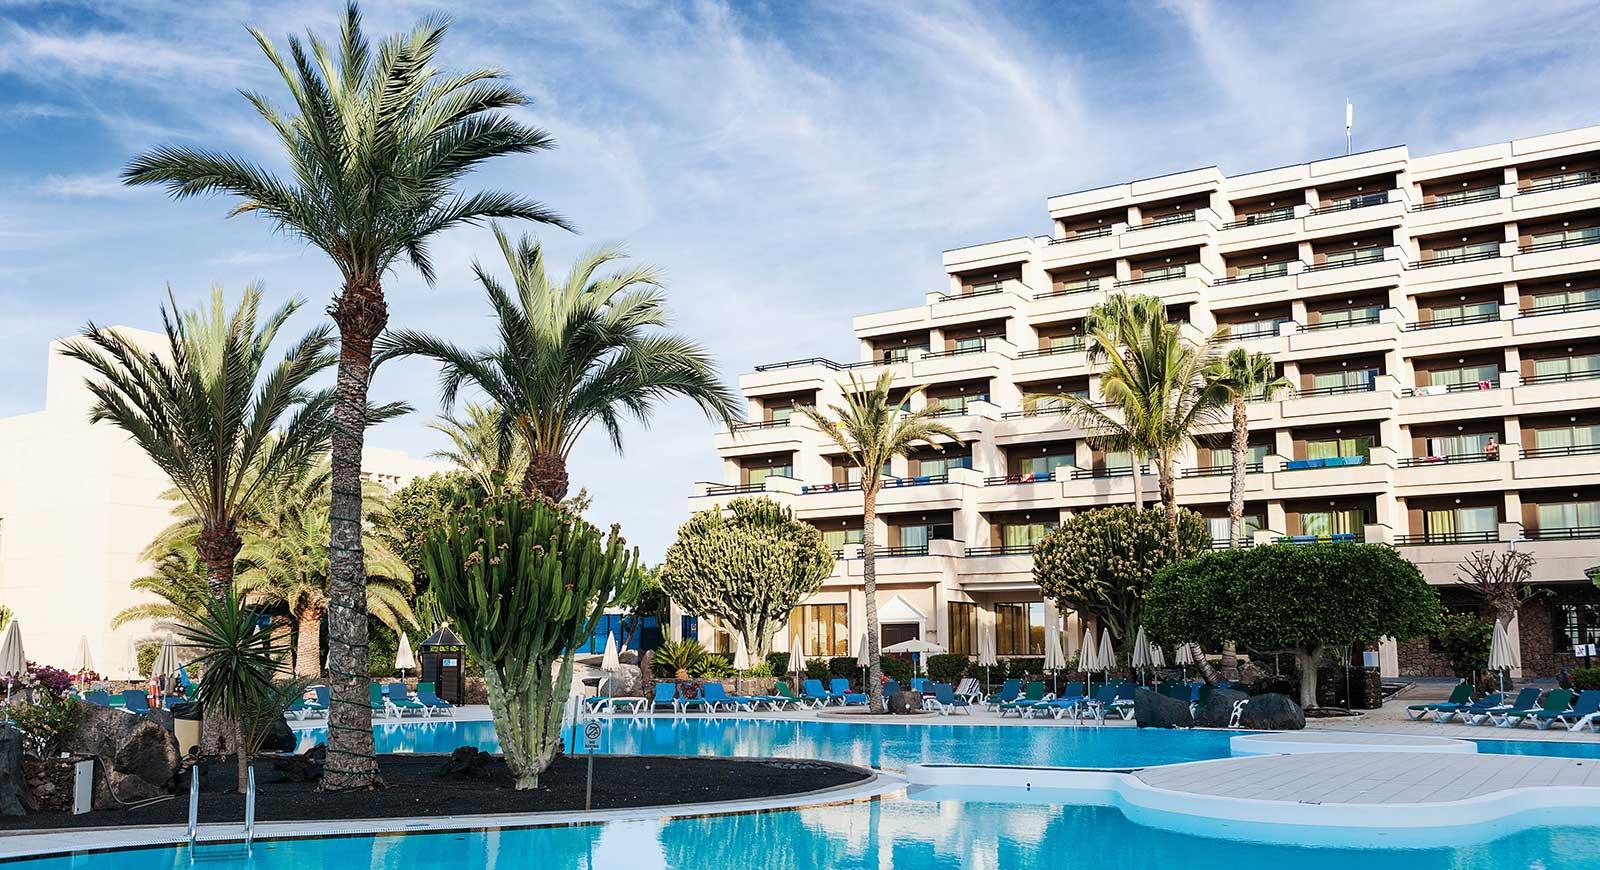 398-swimming-pool-2-hotel-occidental-lanzarote-playa_tcm7-91555_w1600_h870_n